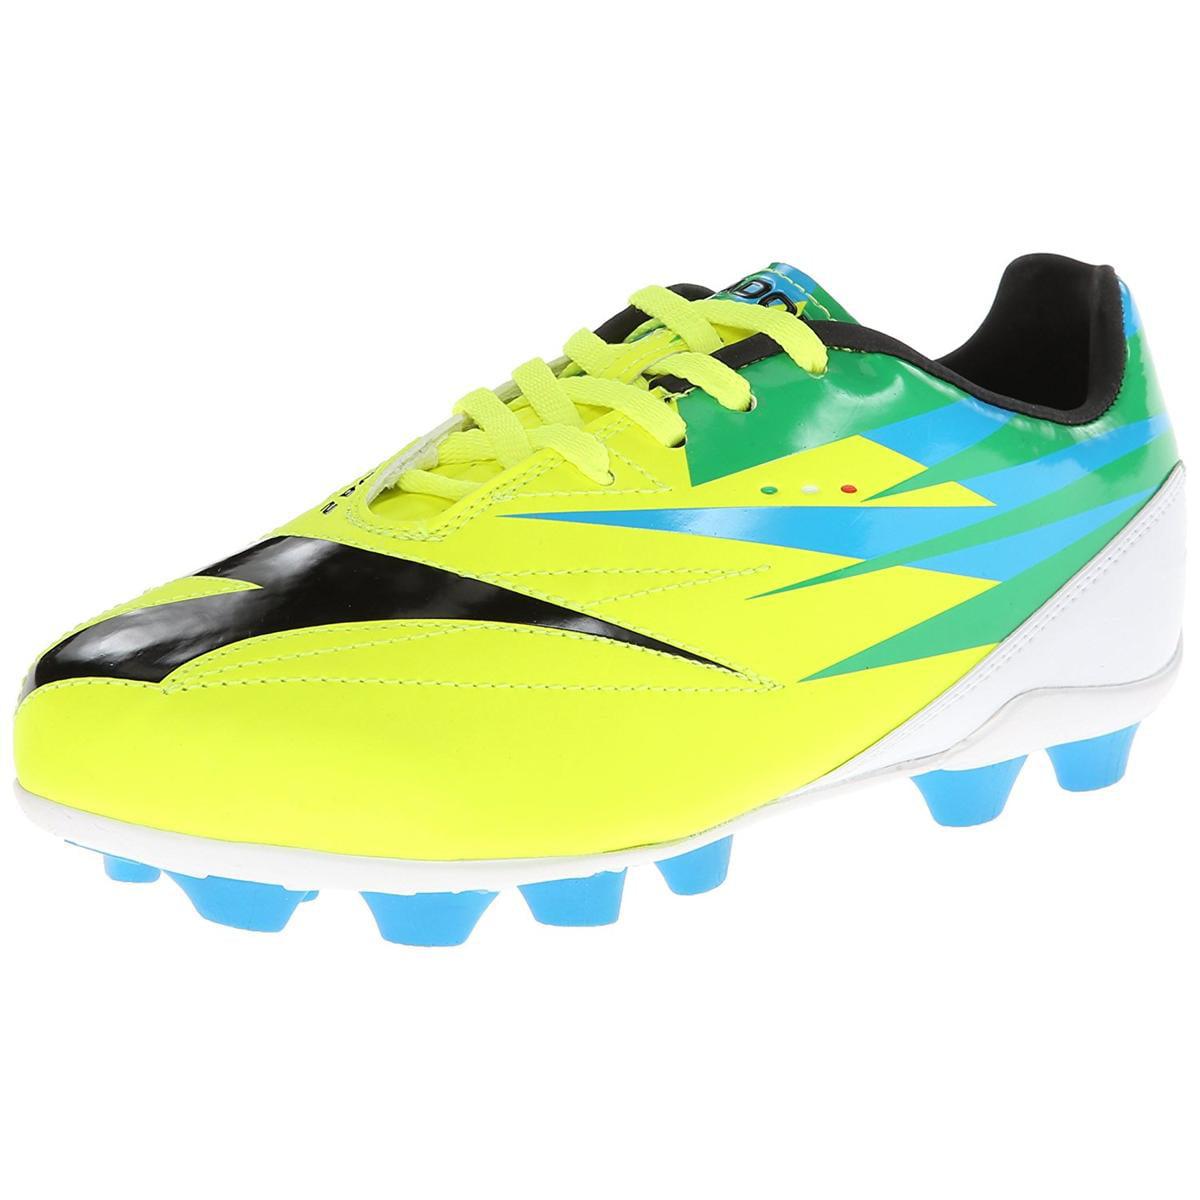 Diadora DD-NA Unisex Yellow/Black/Green Soccer Cleat 6M